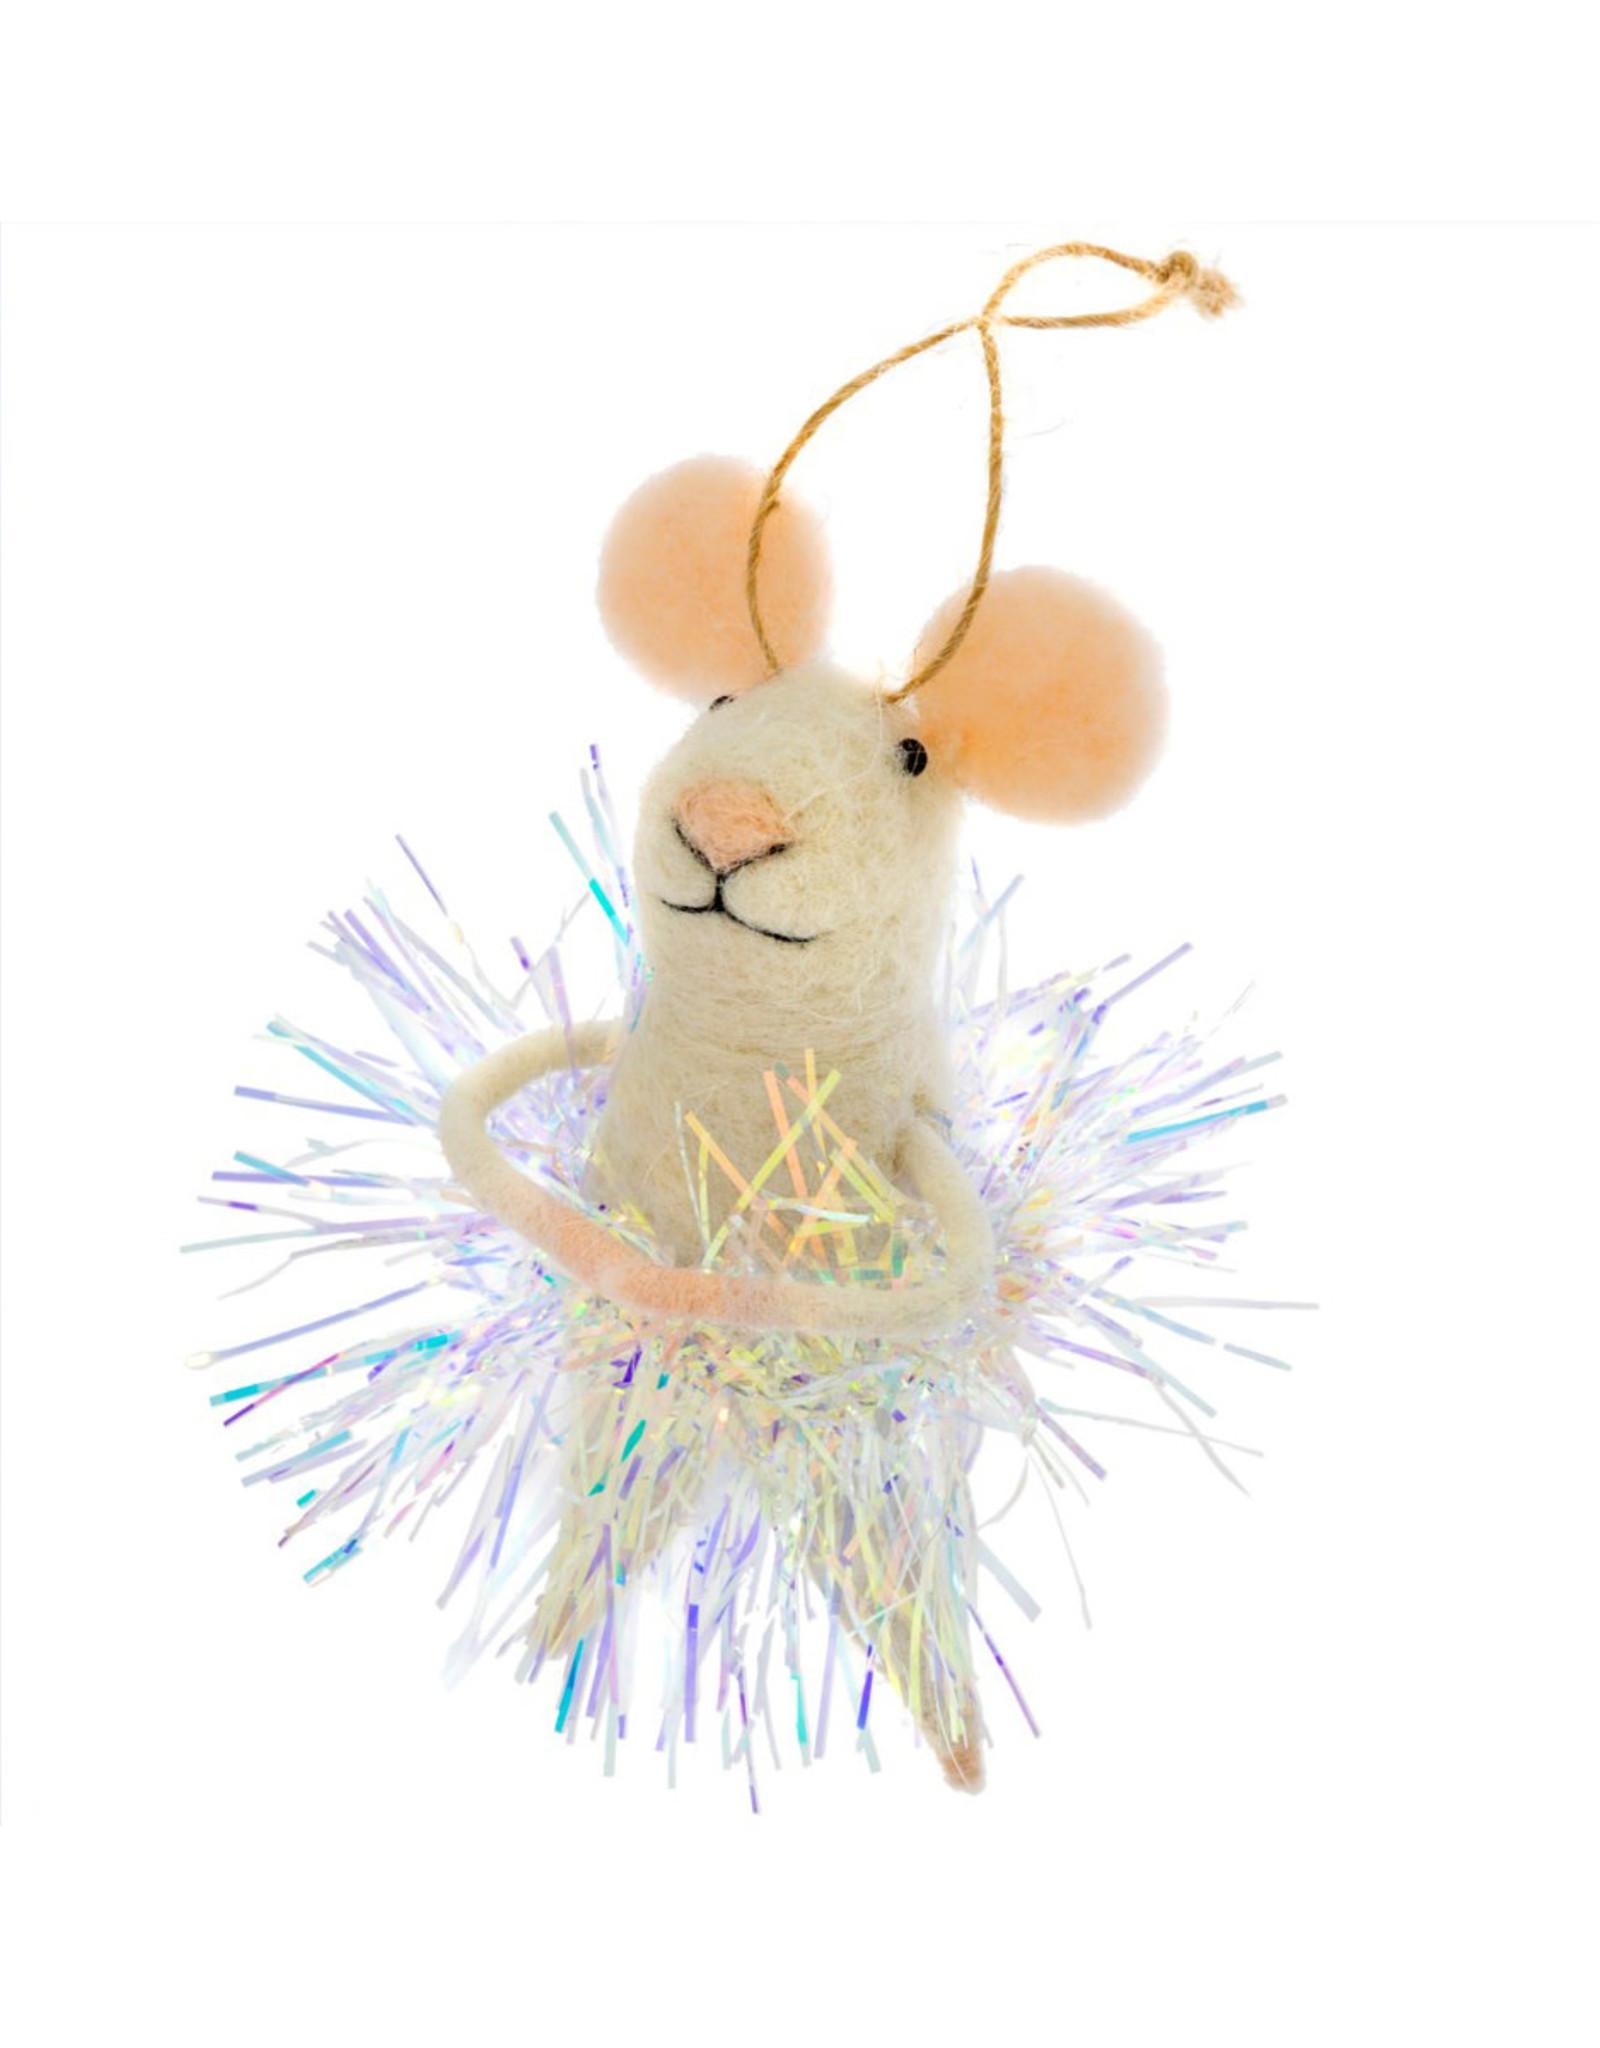 Indaba New Year's Eva Mouse Ornament